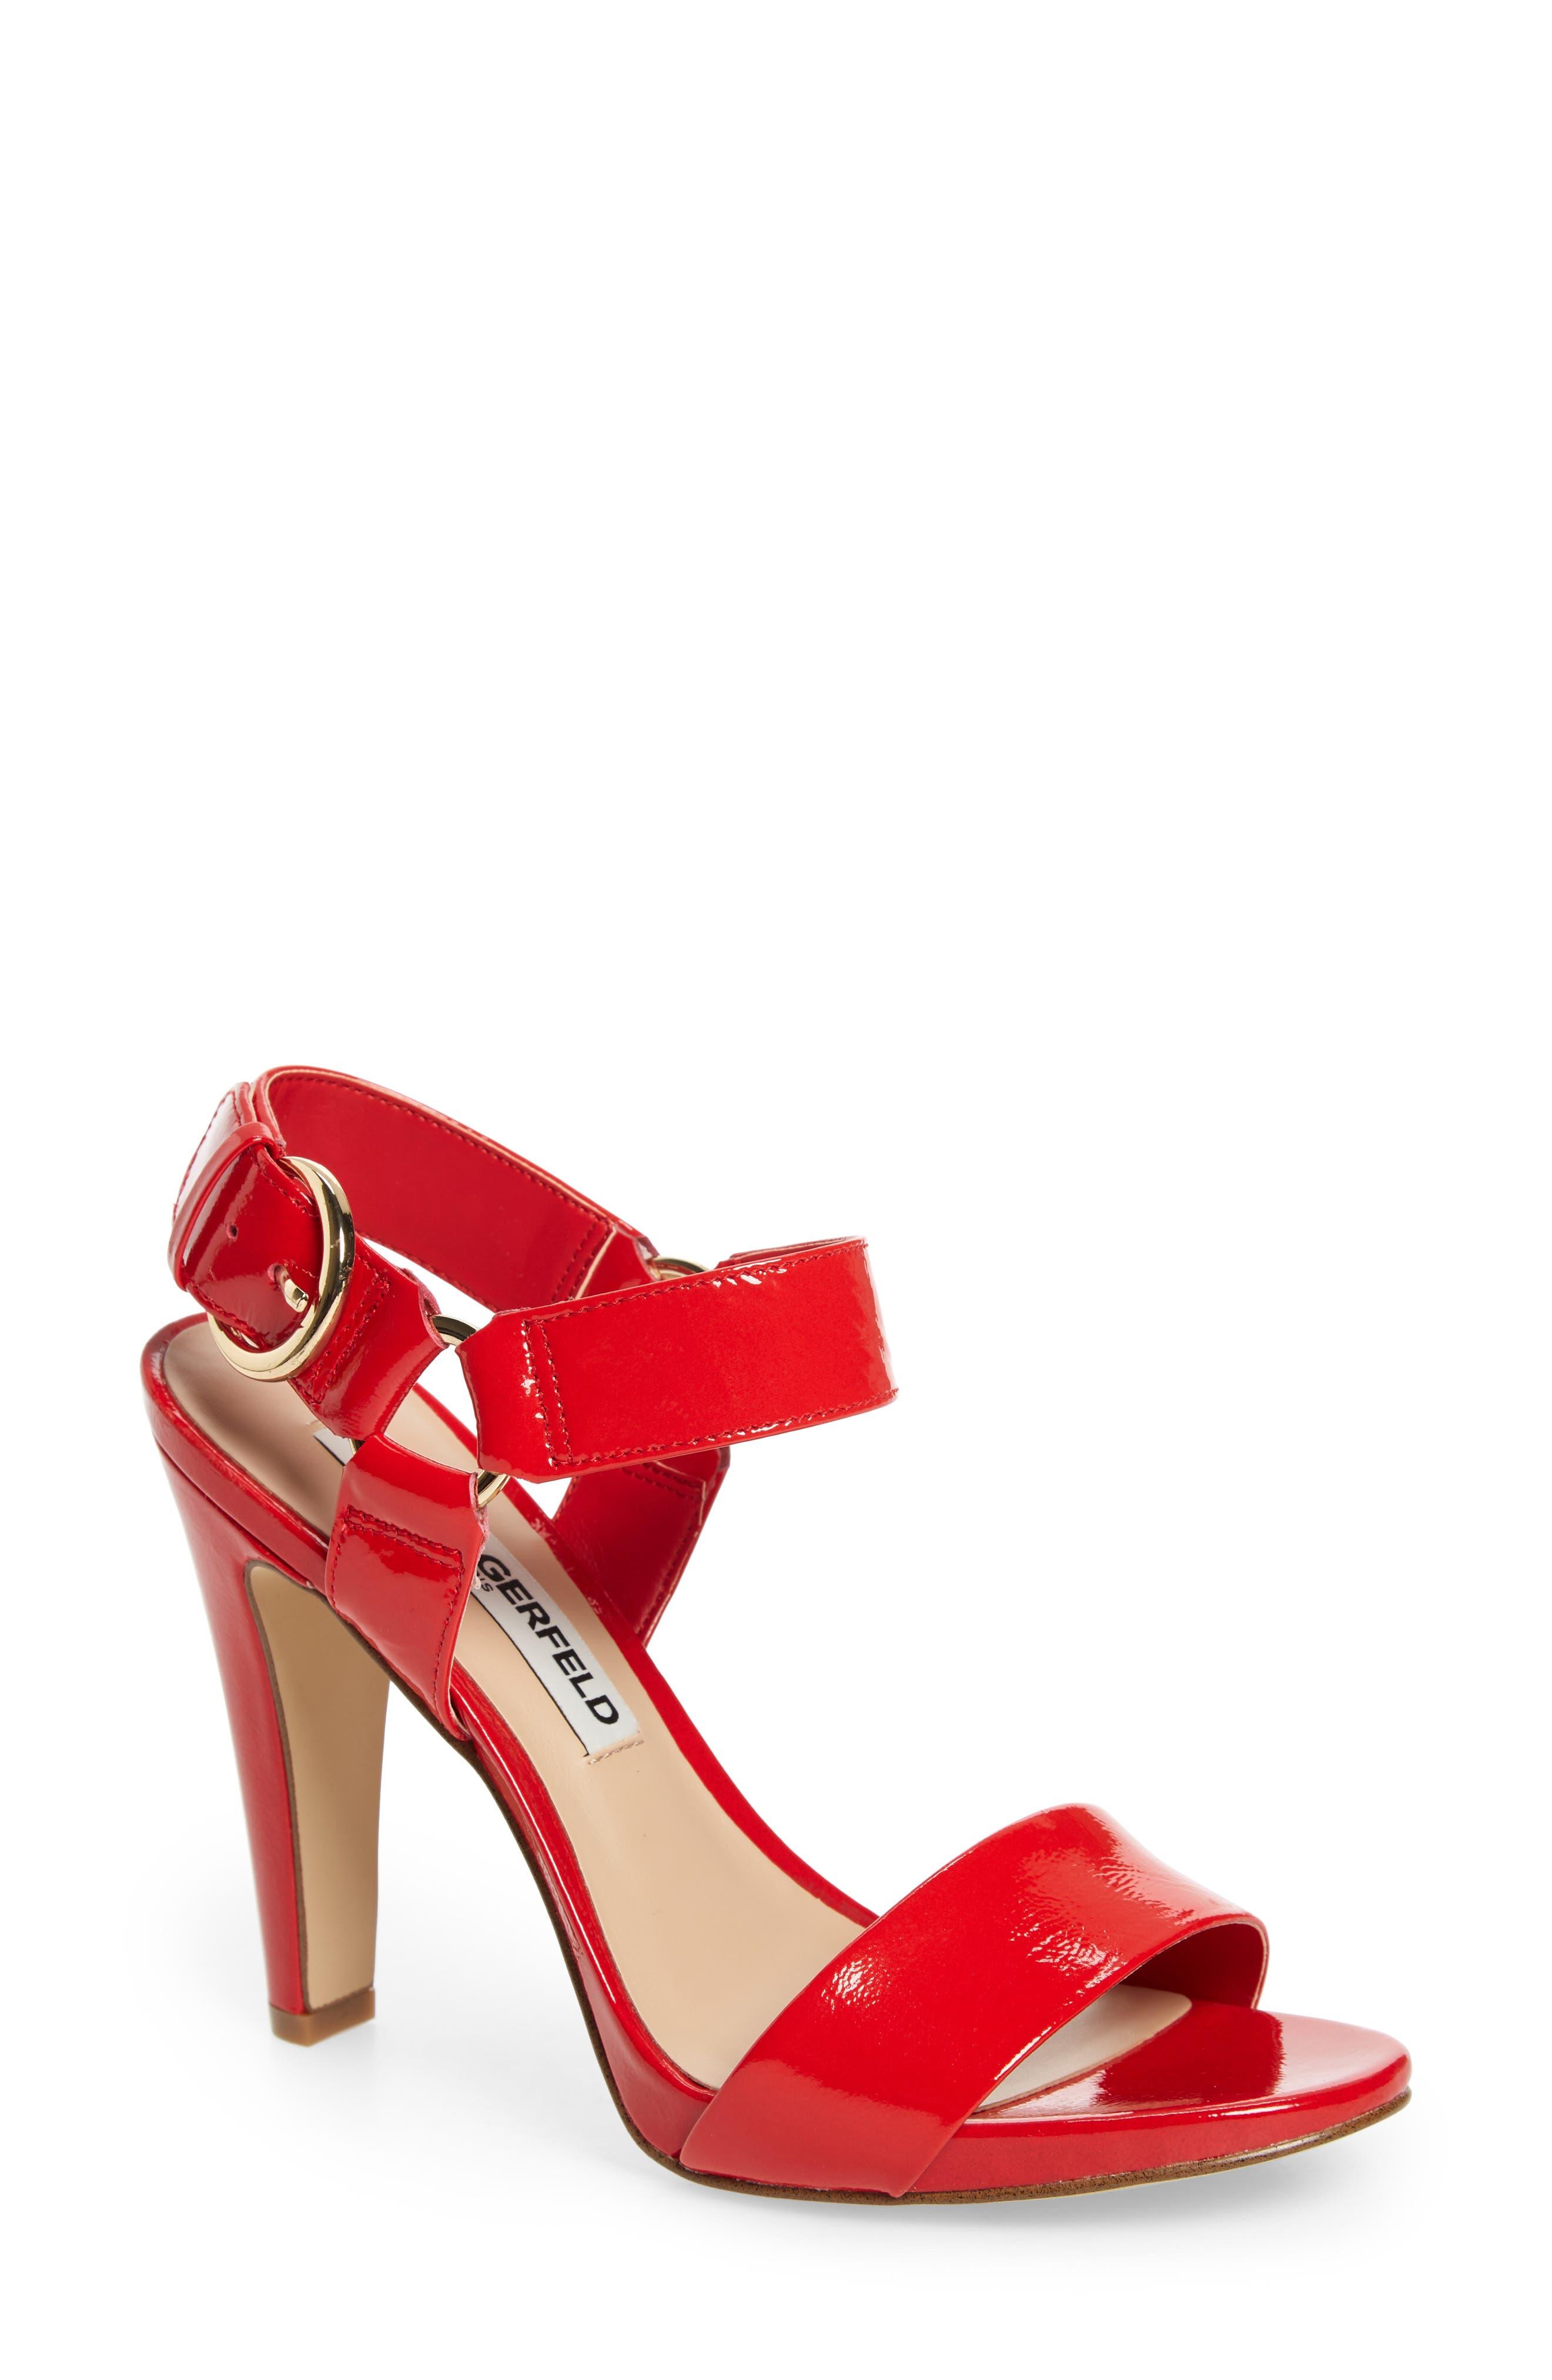 Karl Lagerfeld Paris Cieone Sandal, Red